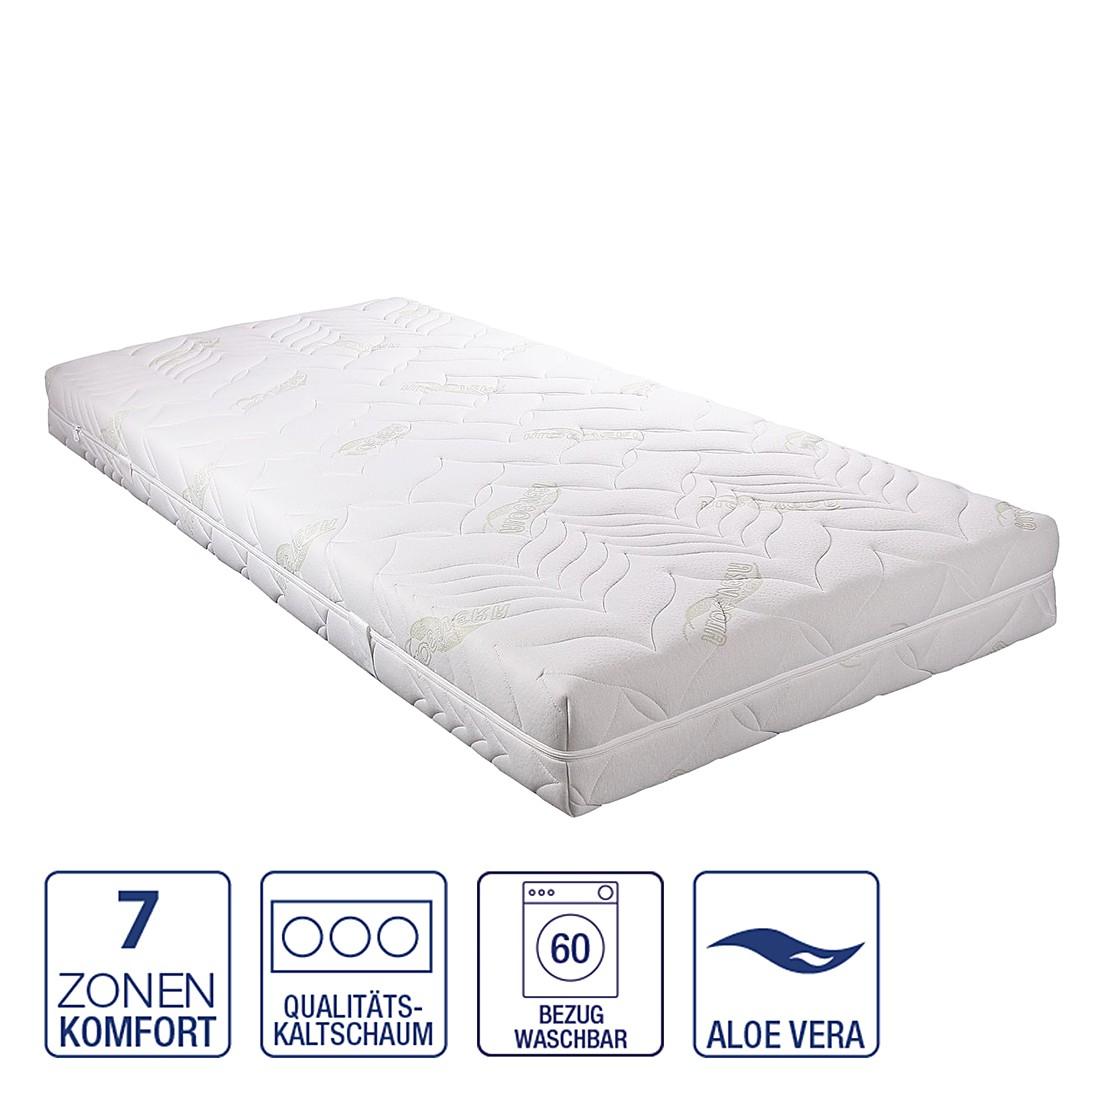 7-Zonen Kaltschaummatratze Tender Sleep – 80 x 200cm – H3 ab 80 kg, Nova Dream Sleepline bestellen